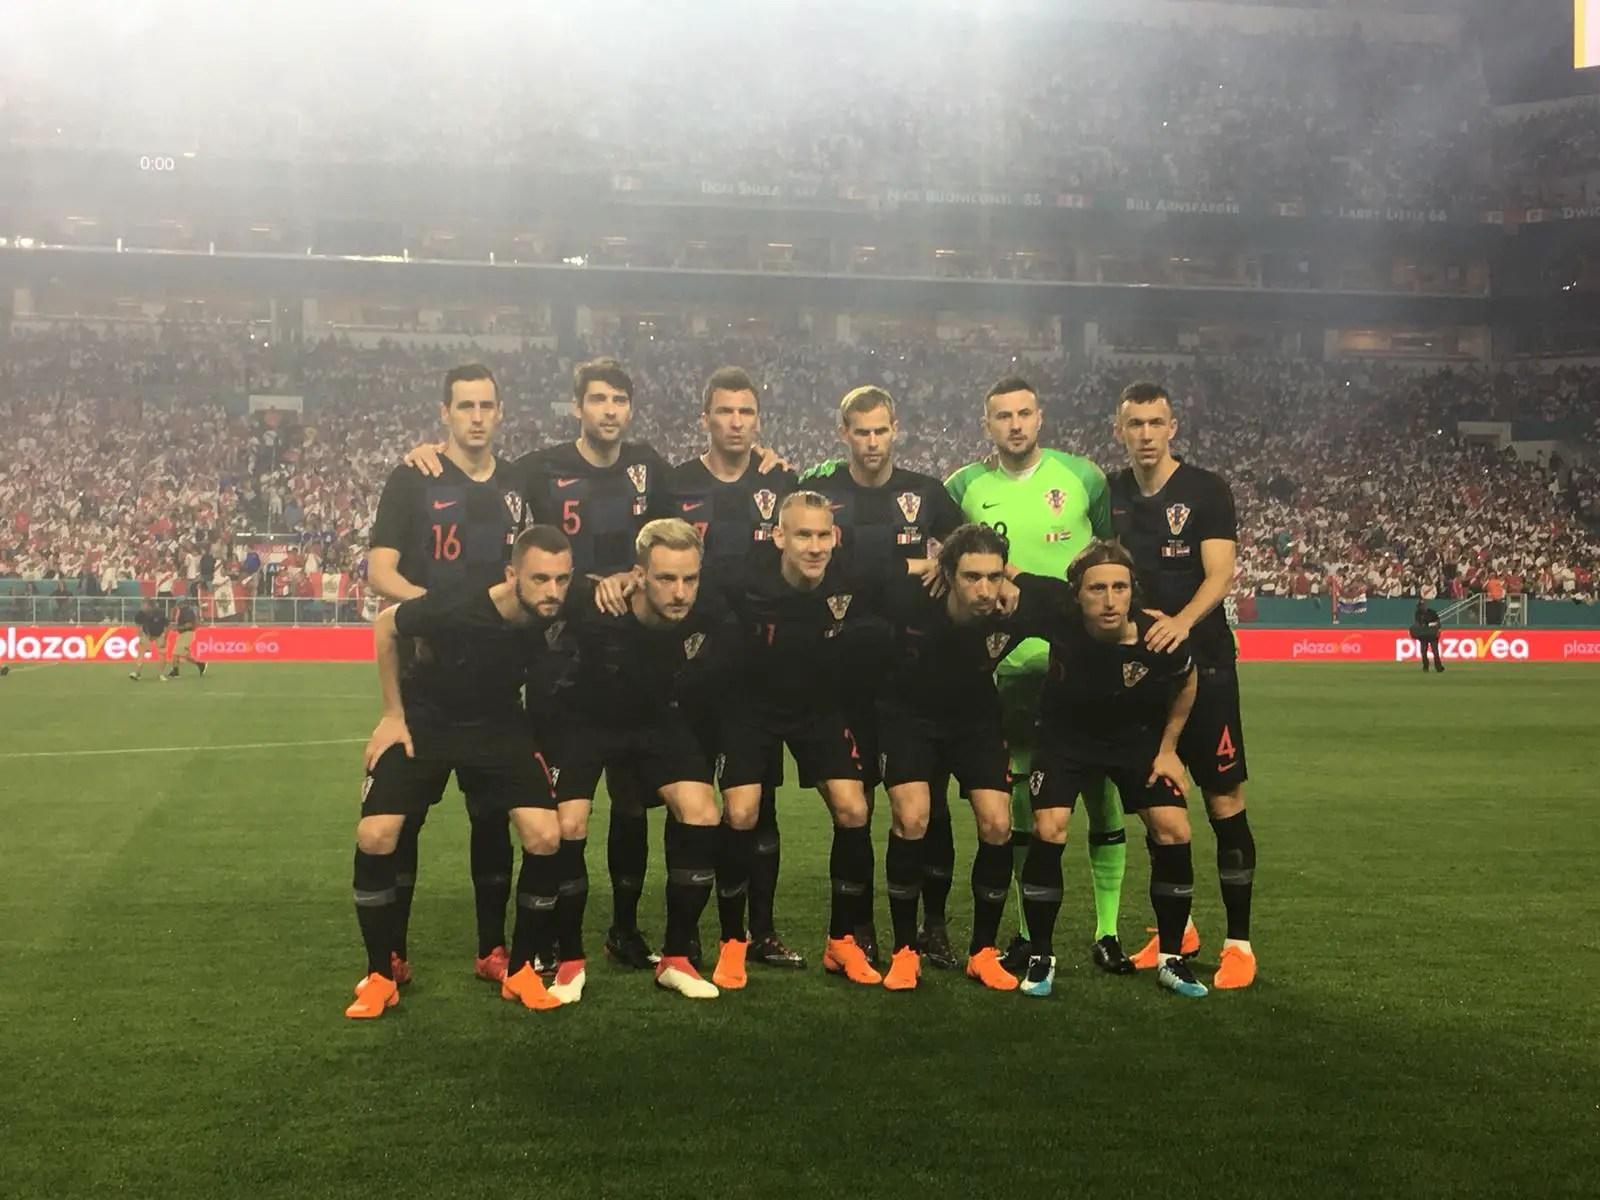 Nigeria's World Cup Foes Croatia, Iceland Lose To Peru, Mexico In Friendlies